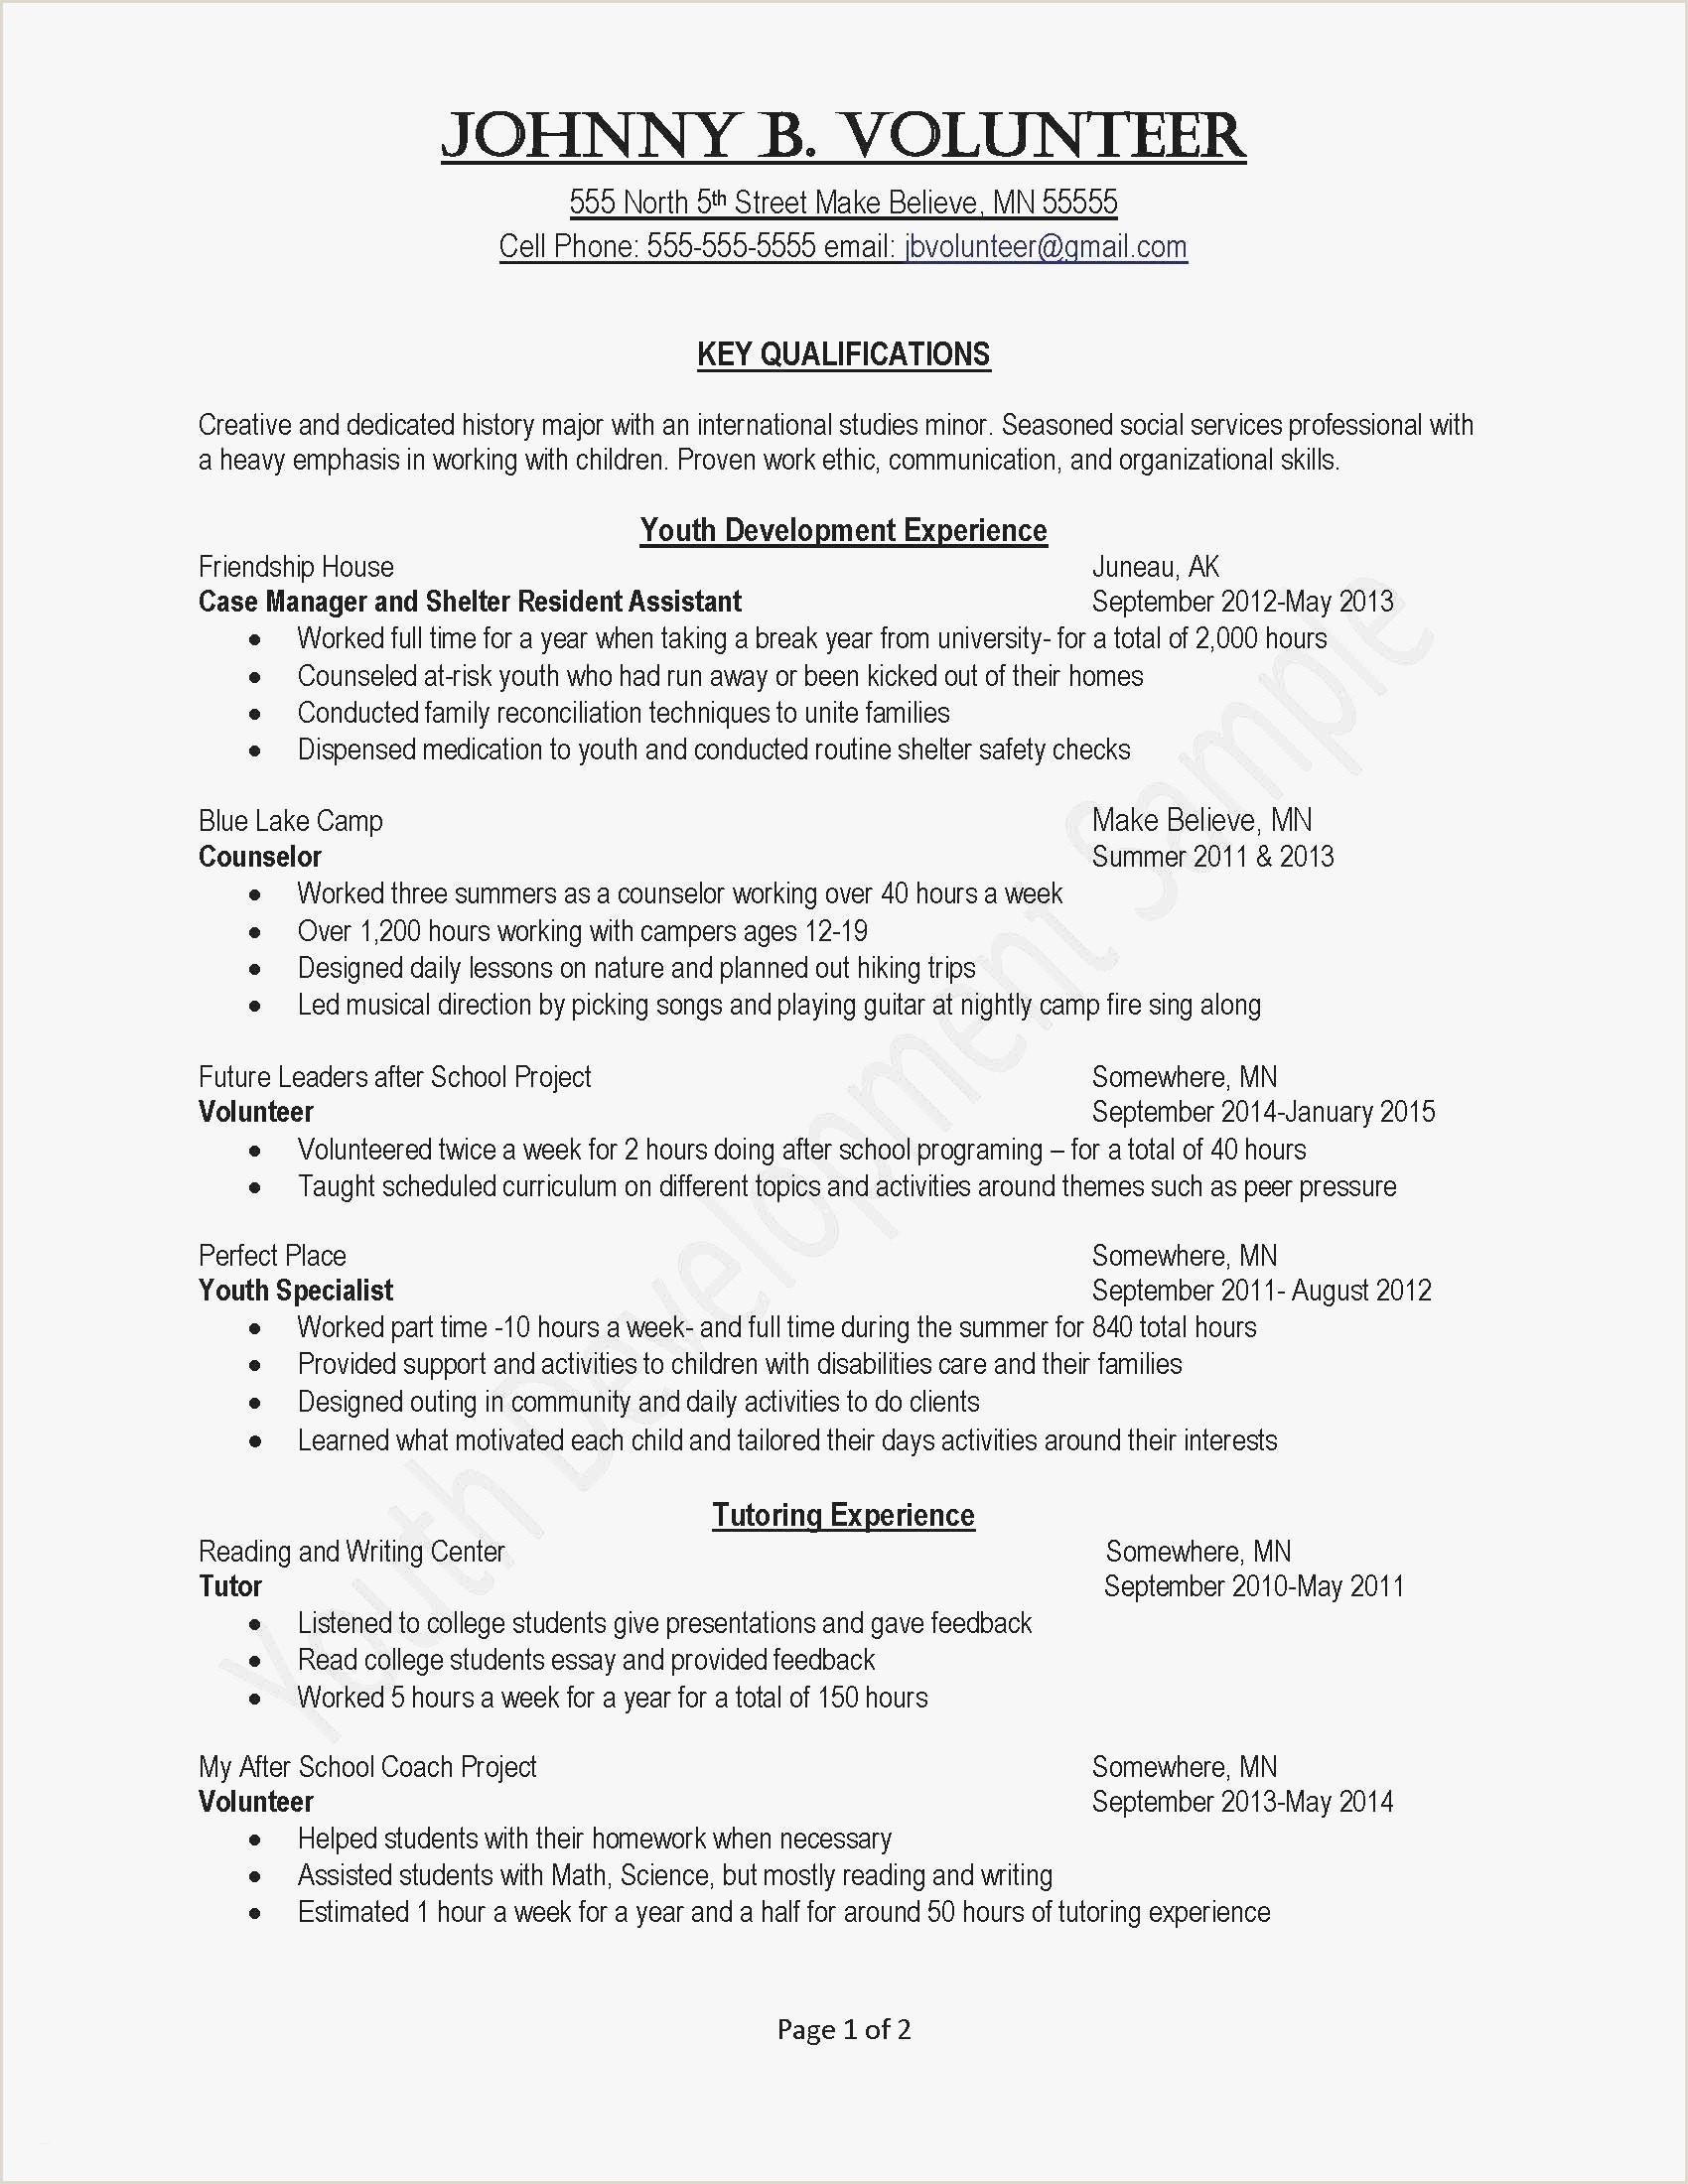 New Tutor Resume Sample